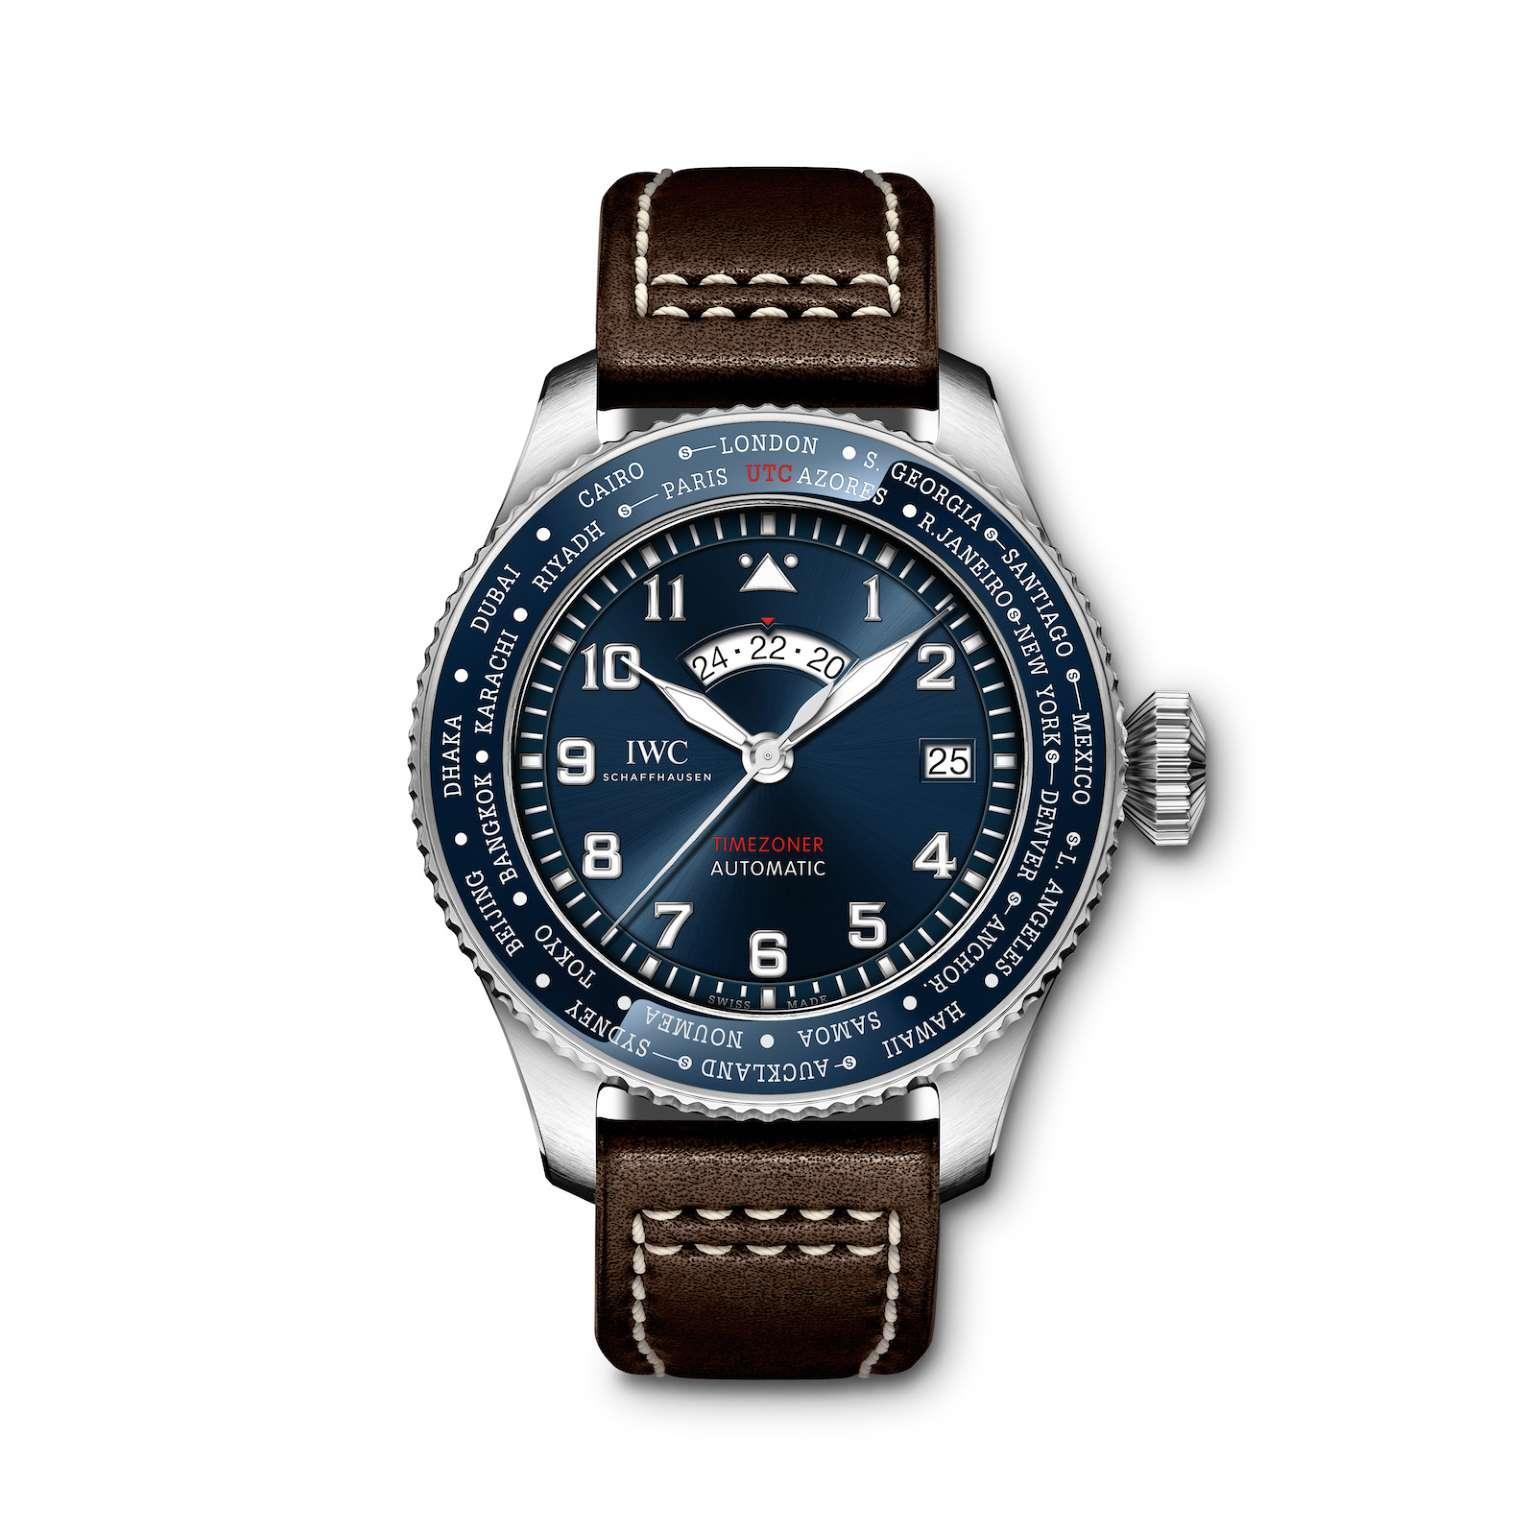 IWC Pilot's Watch Timezoner edición Le Petit Prince